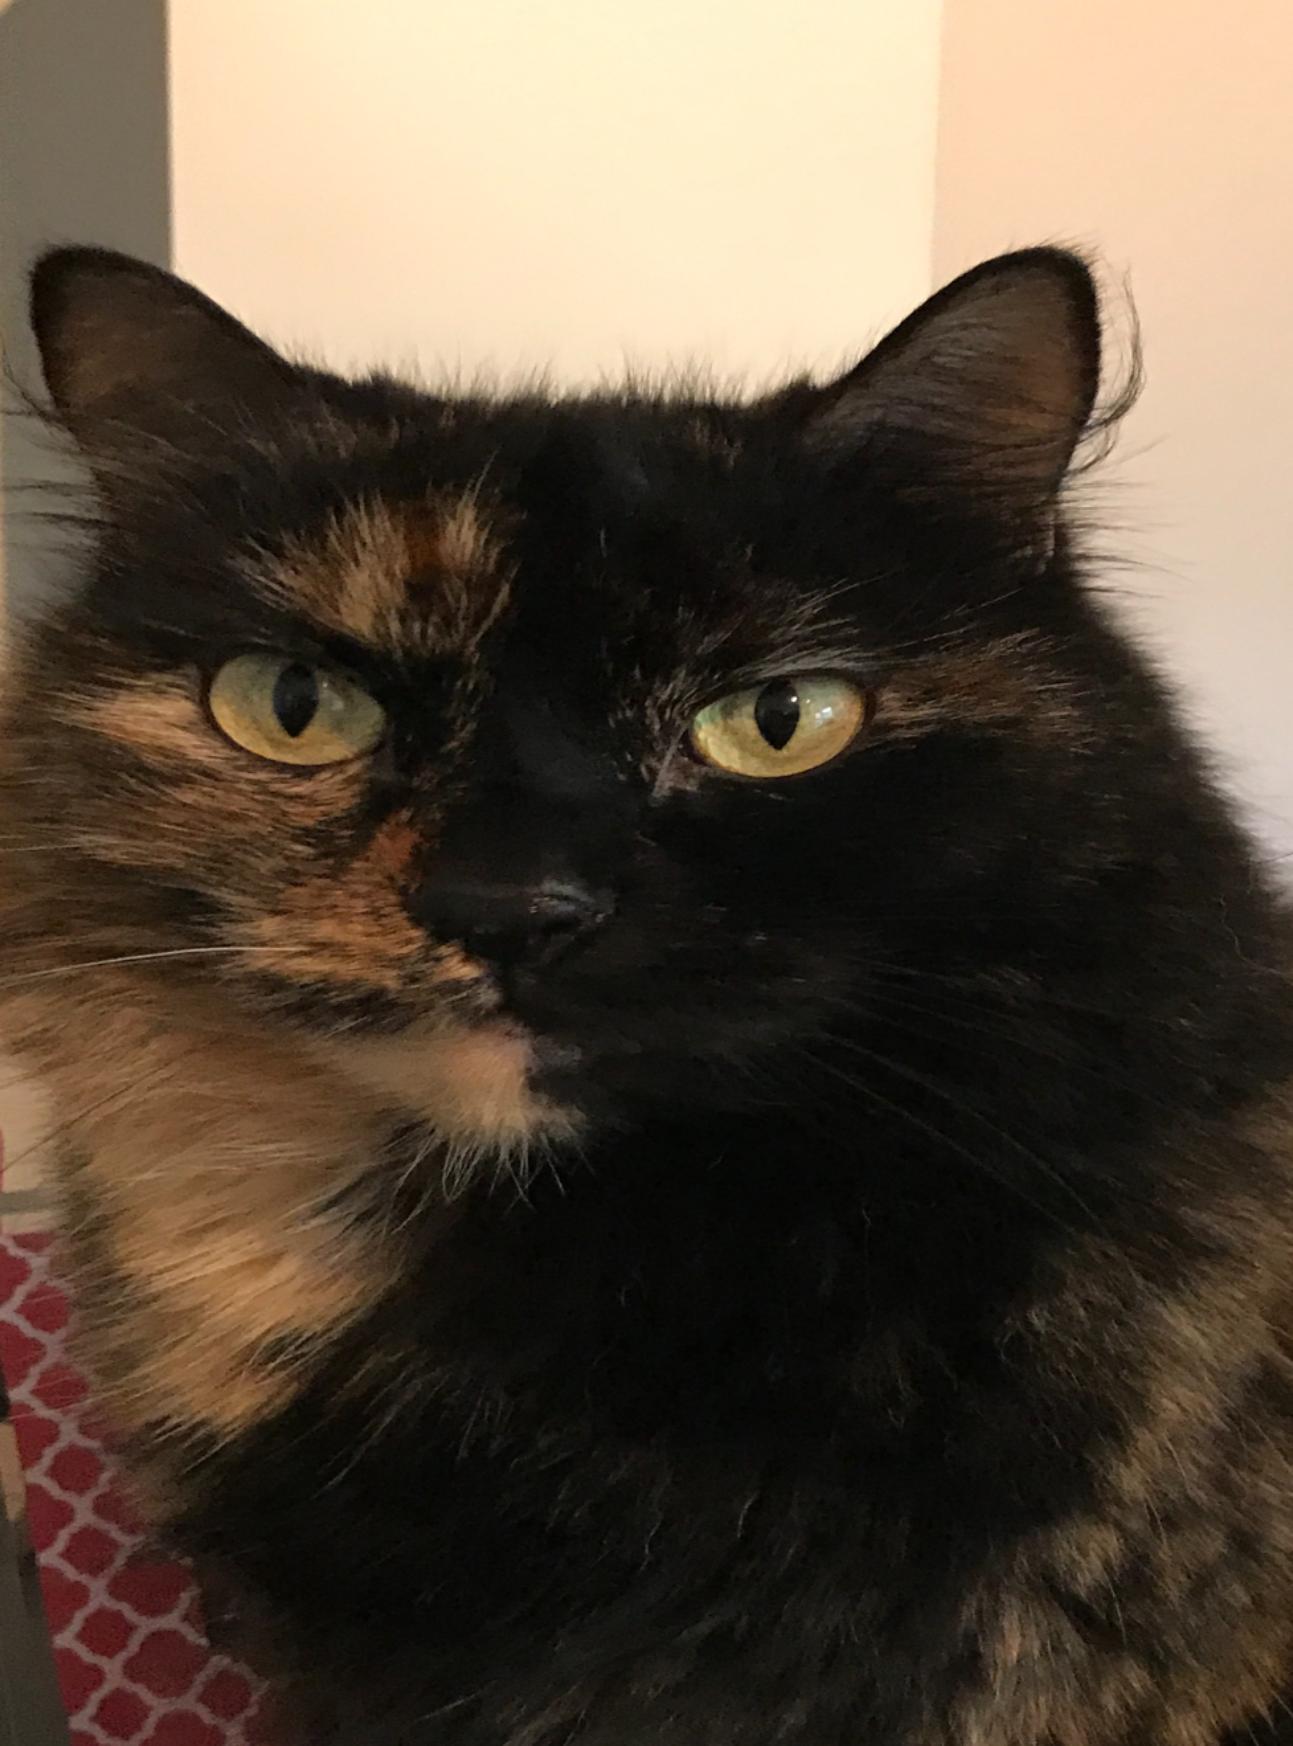 Sasha - Cat# 12  (1 vote)